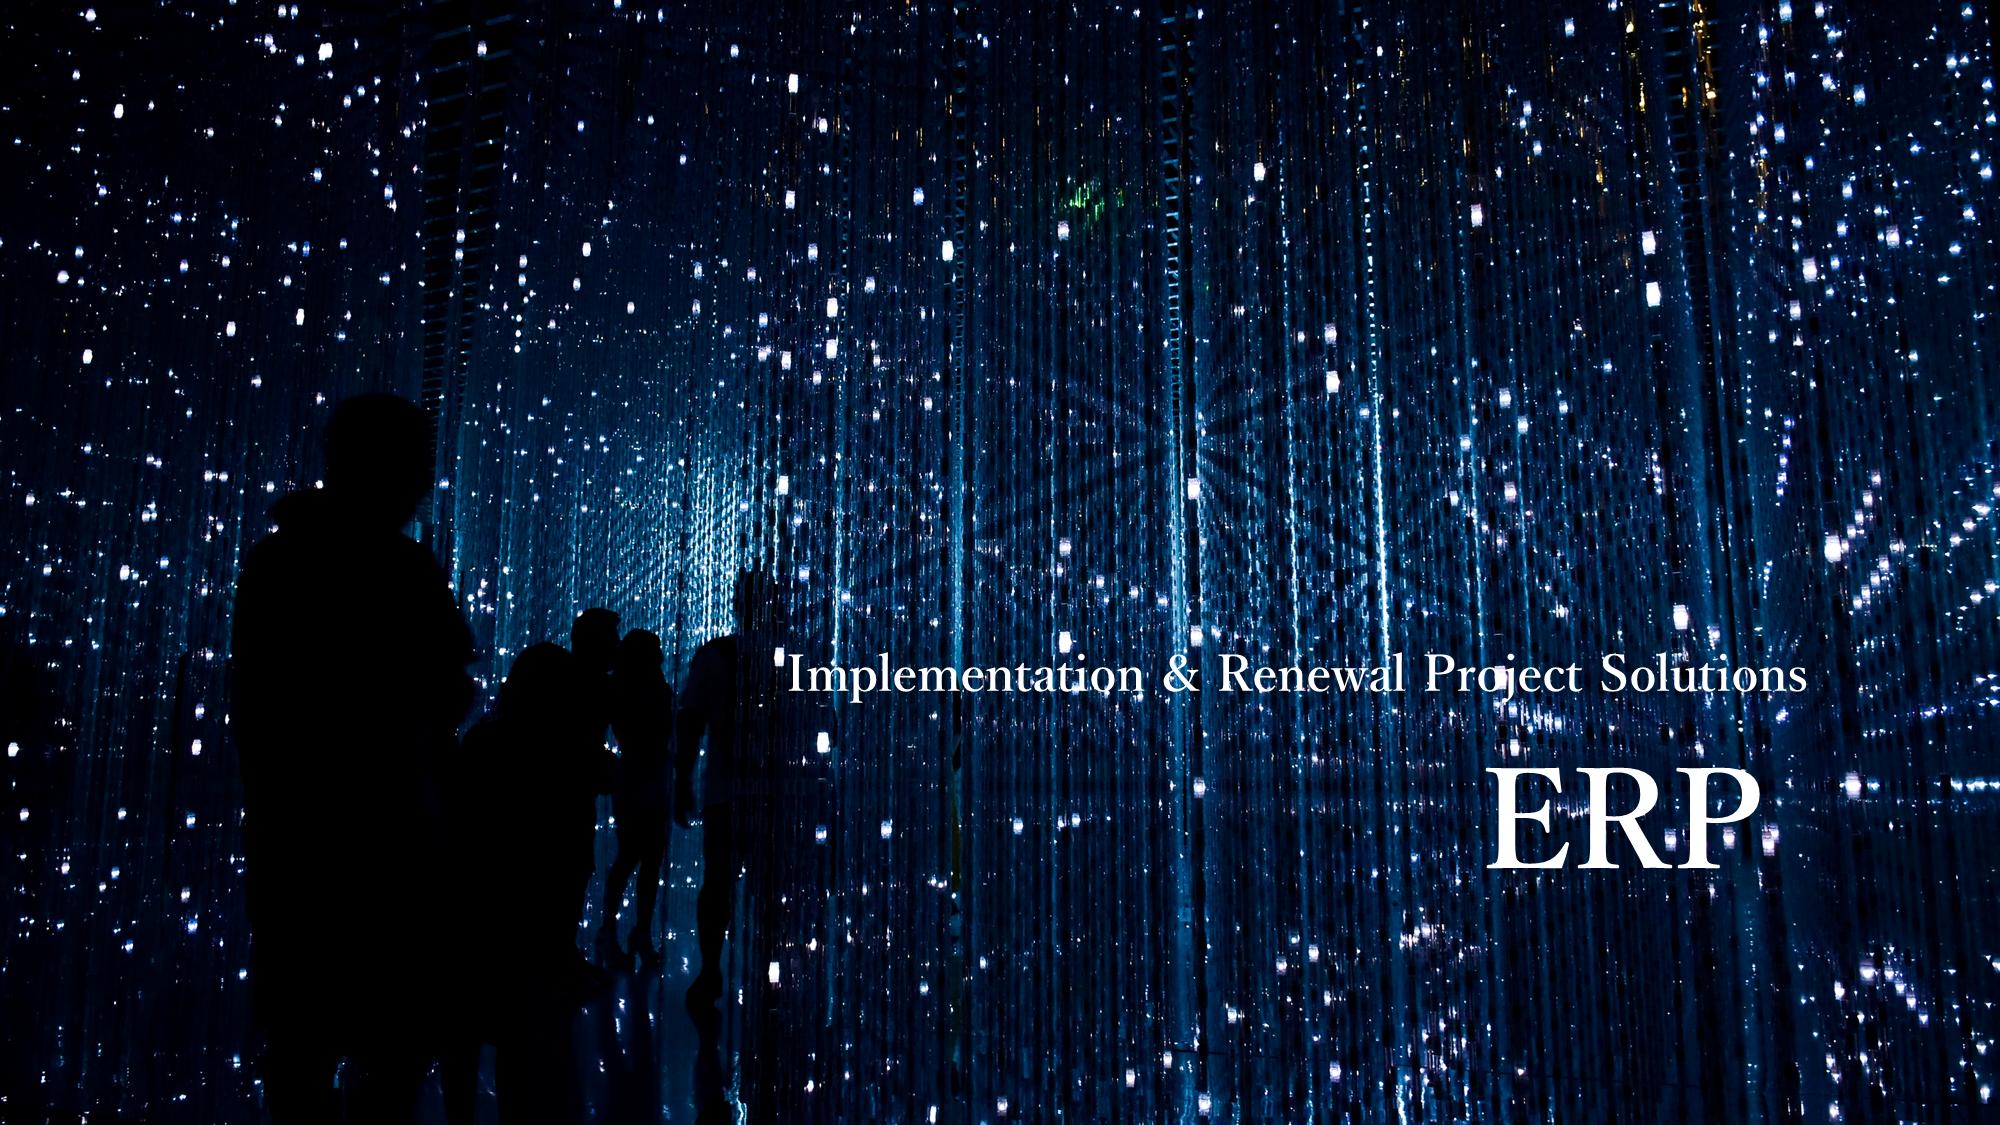 ERP導入(刷新)プロジェクト・ソリューションのイメージ画像